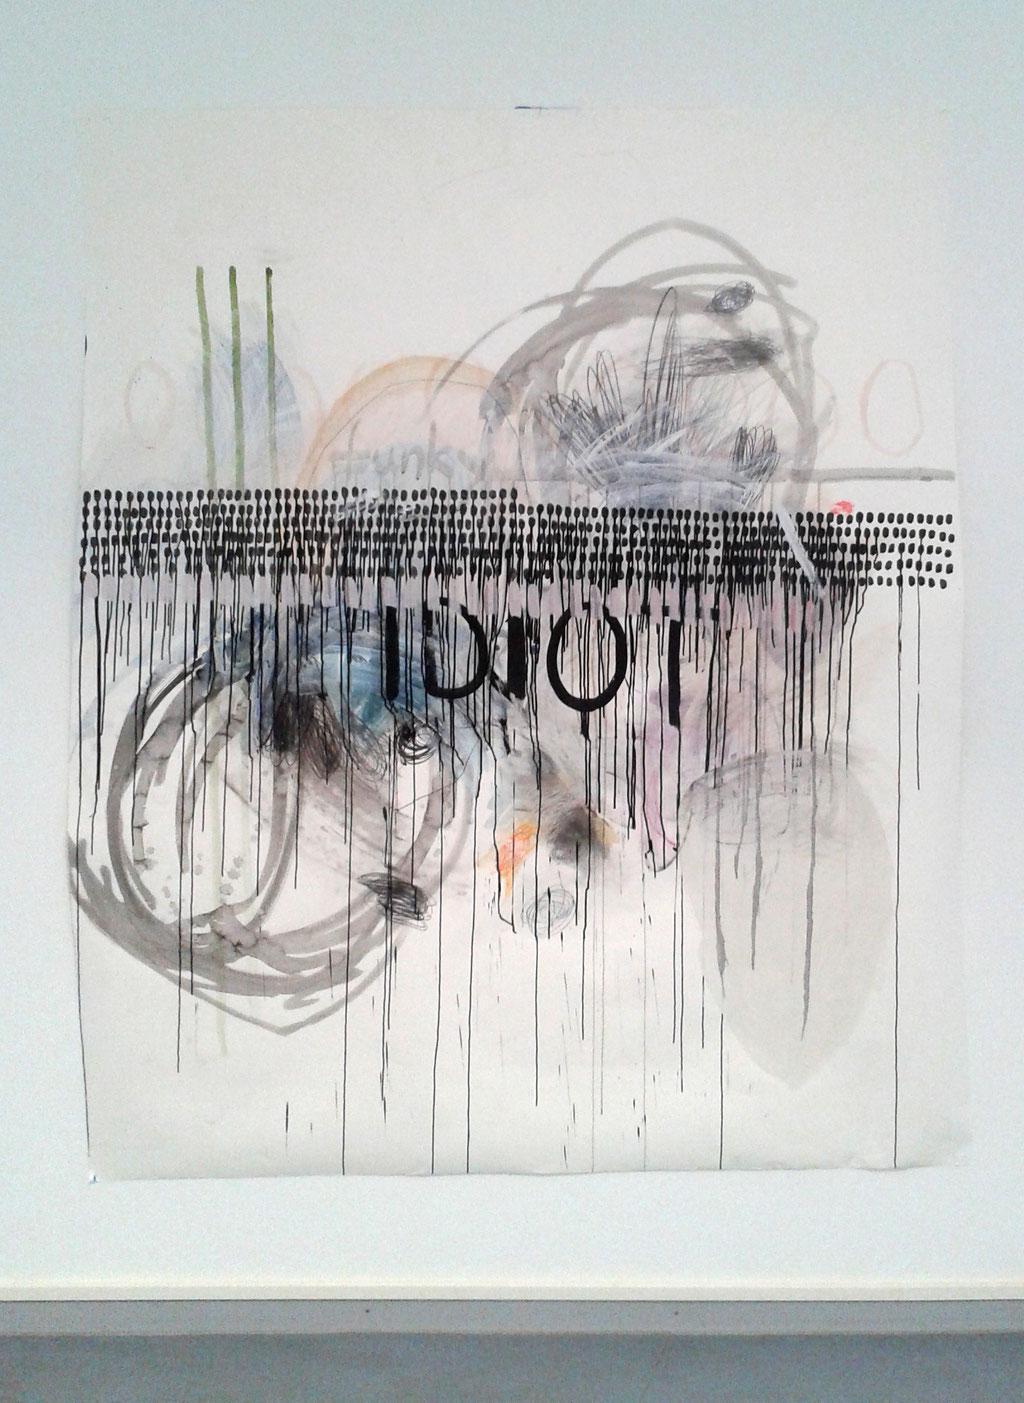 funky IDIOT Acryl, Aquarell, Graphit, Buntstifte, Kreiden, Tusche auf Papier 218 cm x 183 cm